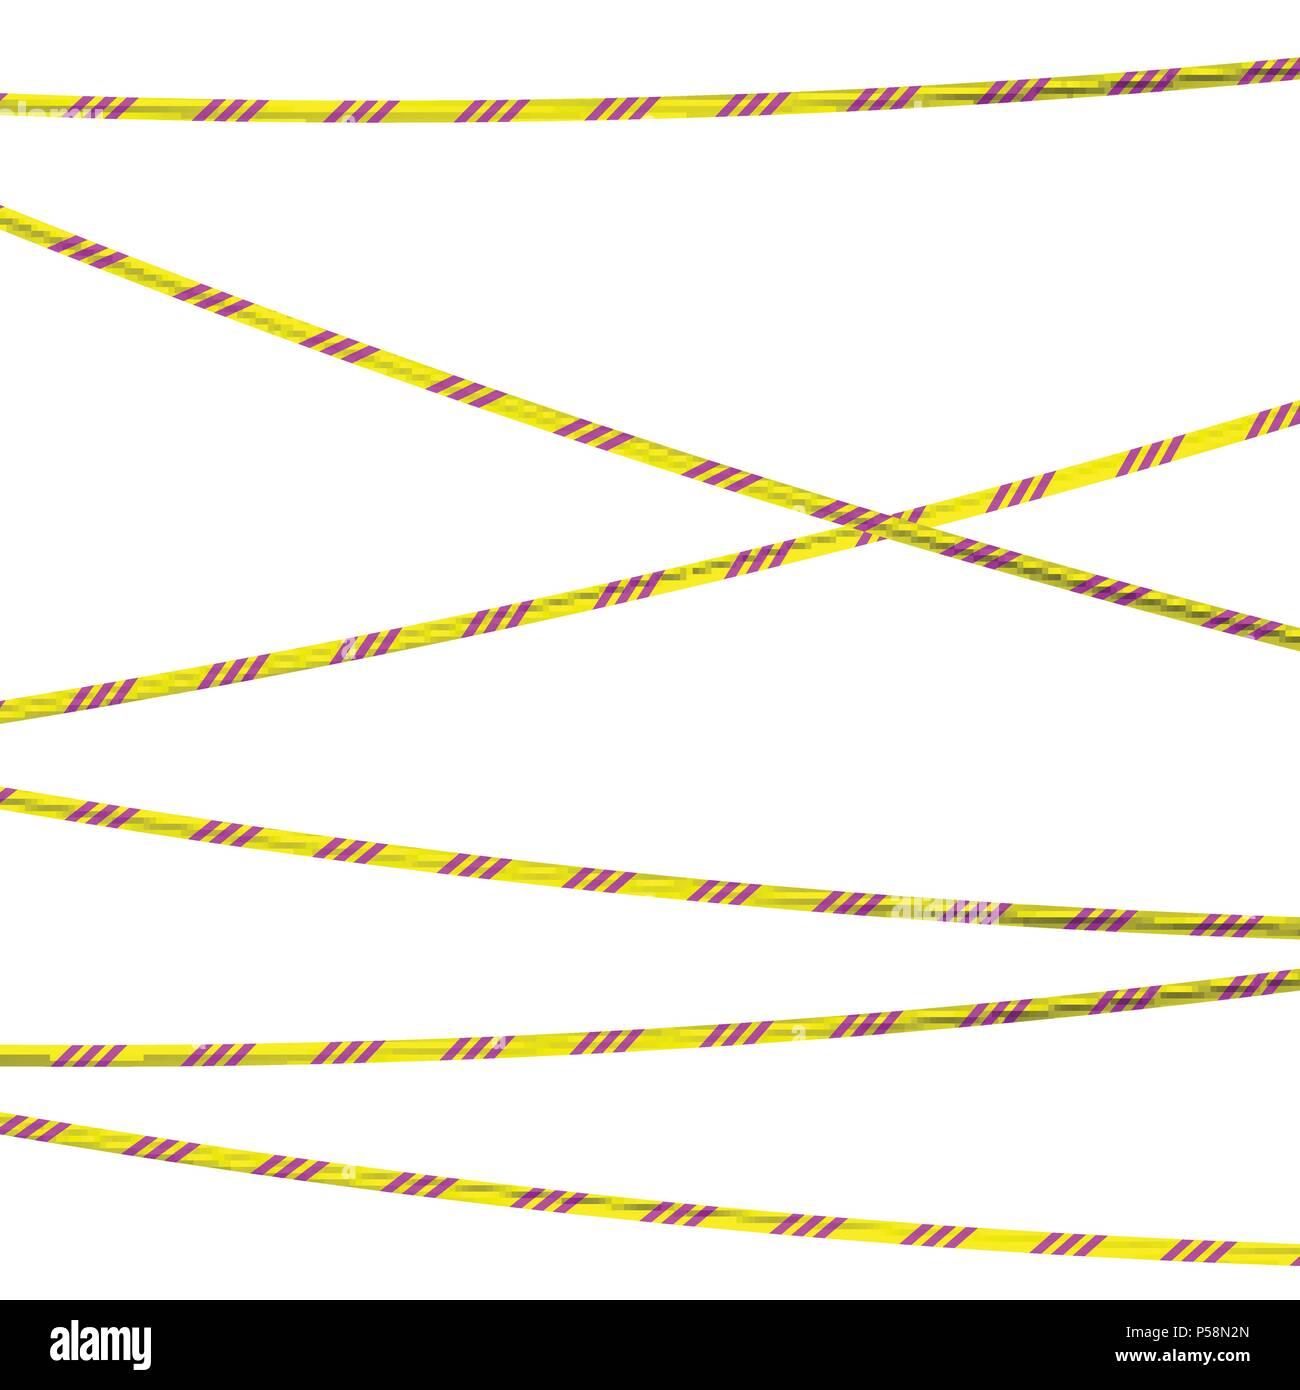 Radiation hazards tape - Stock Vector